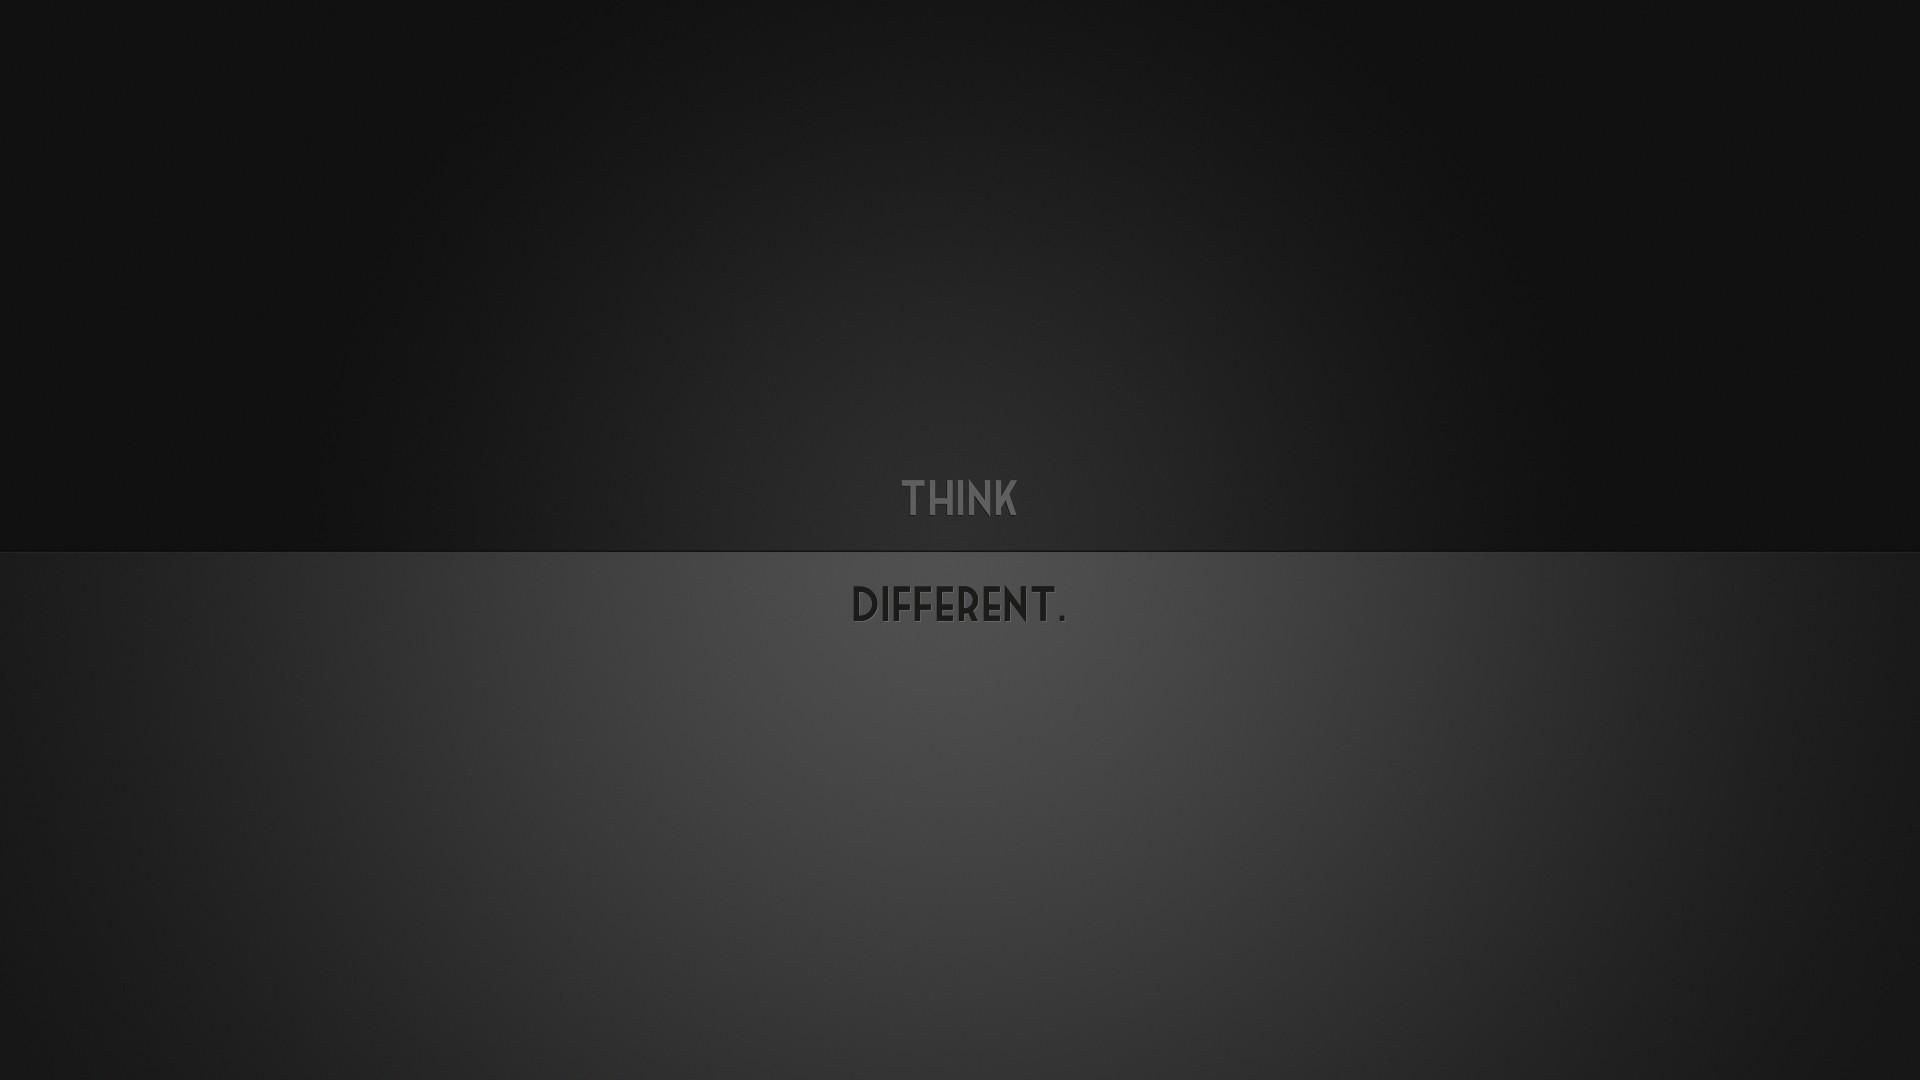 5. minimalist-desktop-wallpaper5-600×338